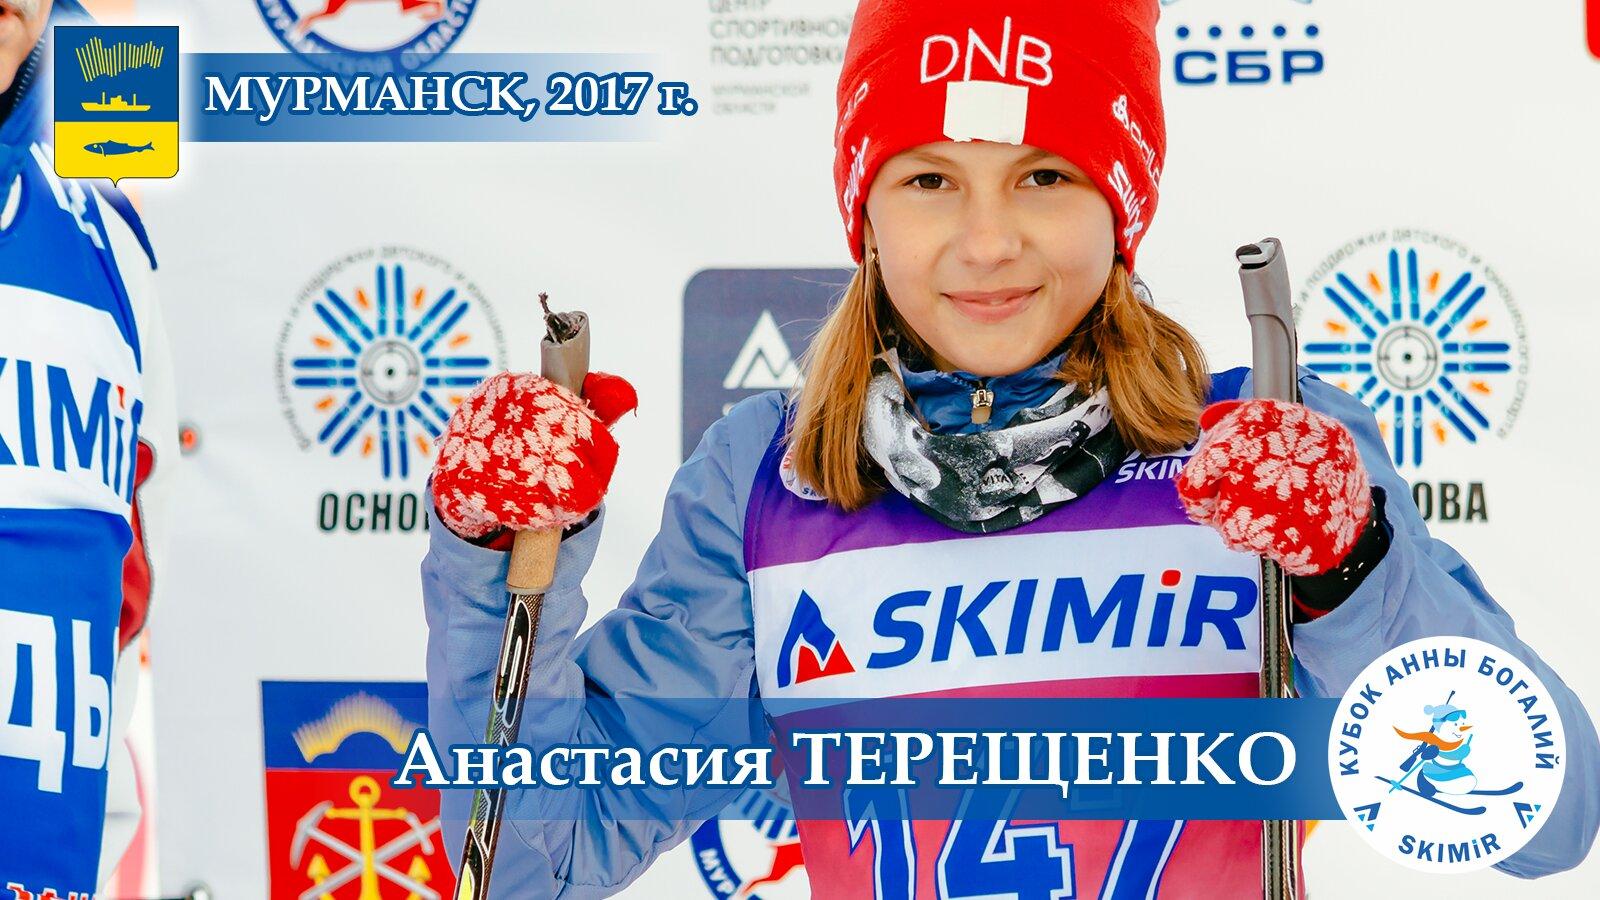 8 Анастасия Терещенко_Магнитогорск.jpg